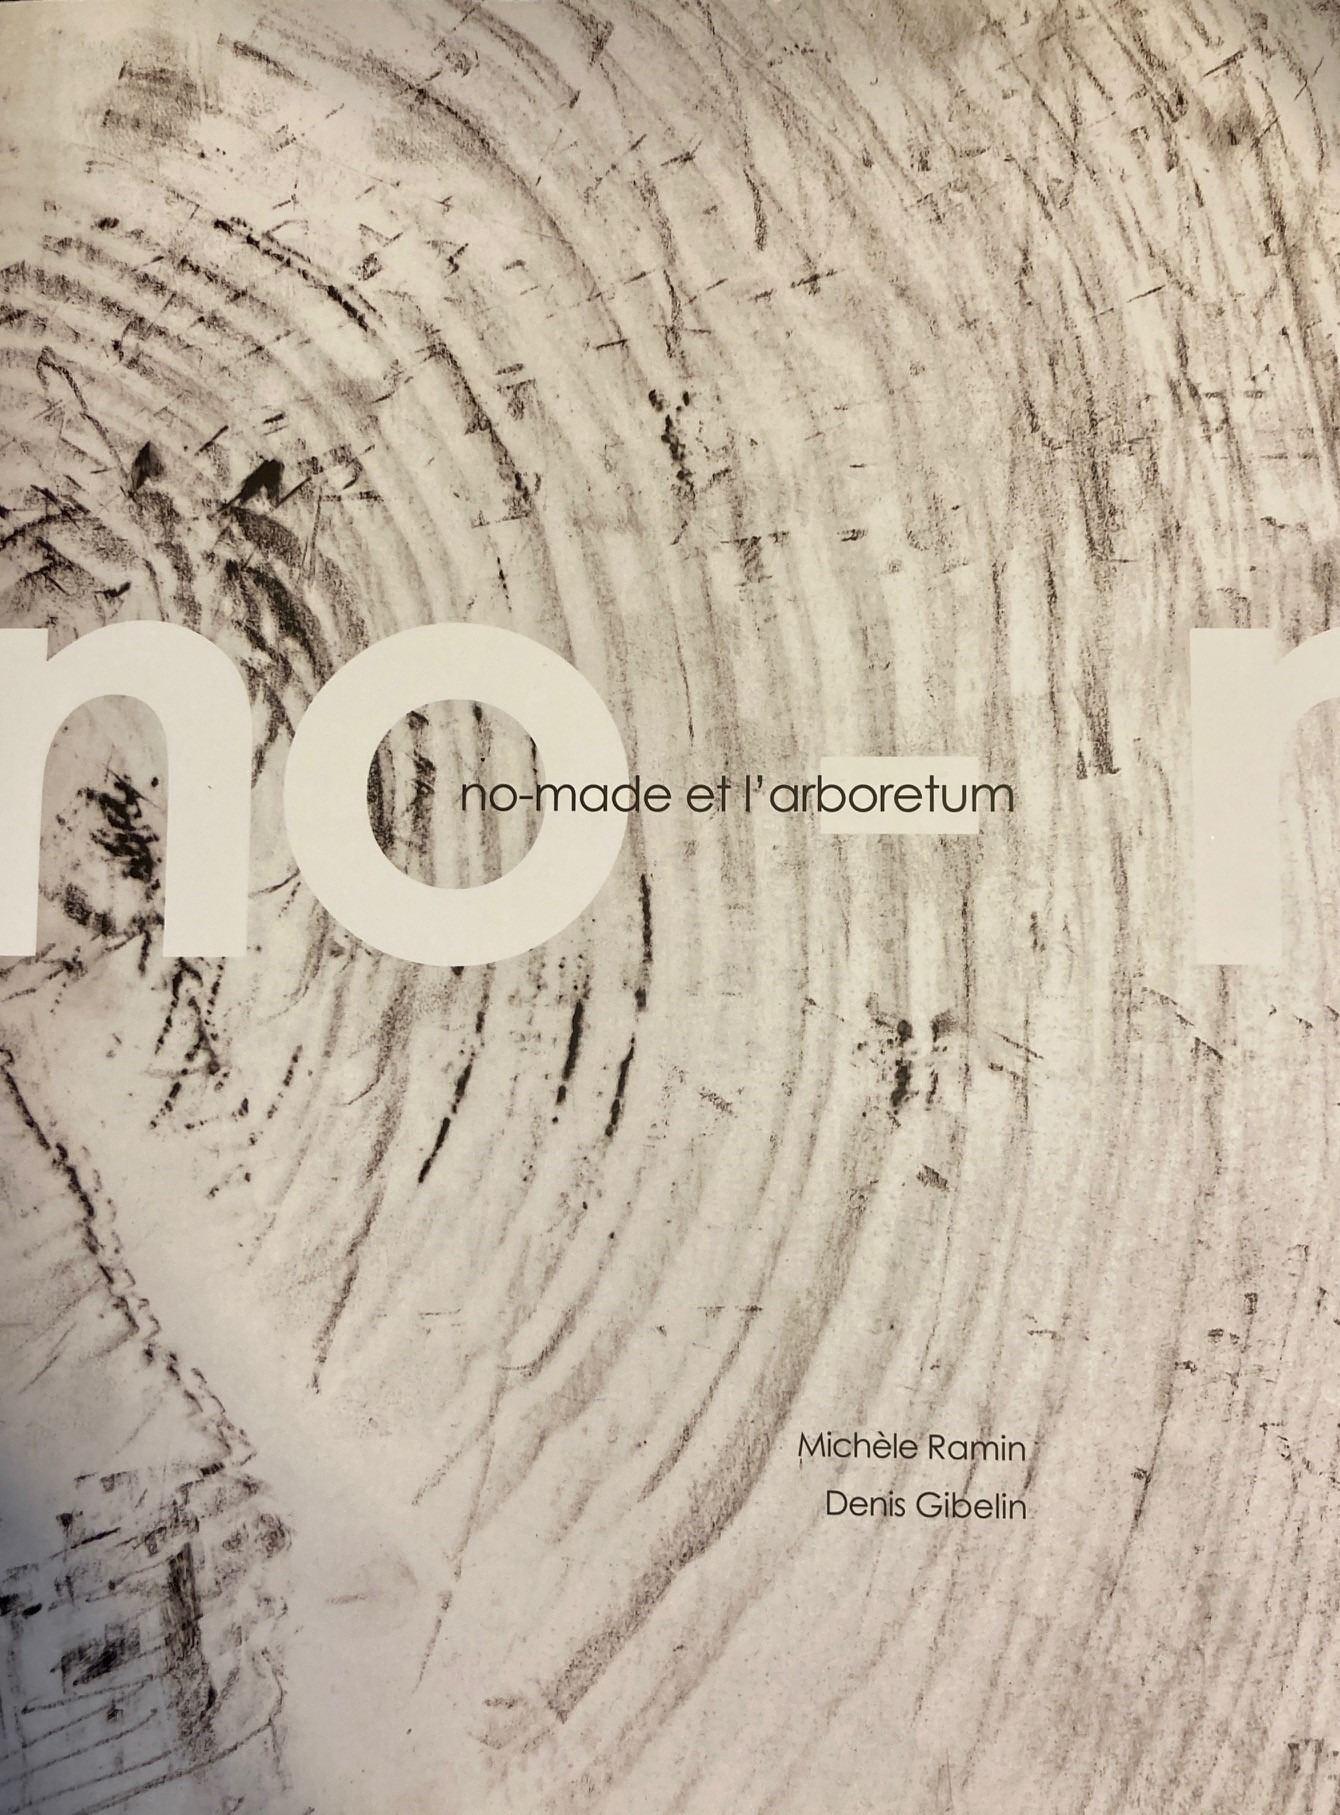 couverture livre nomade